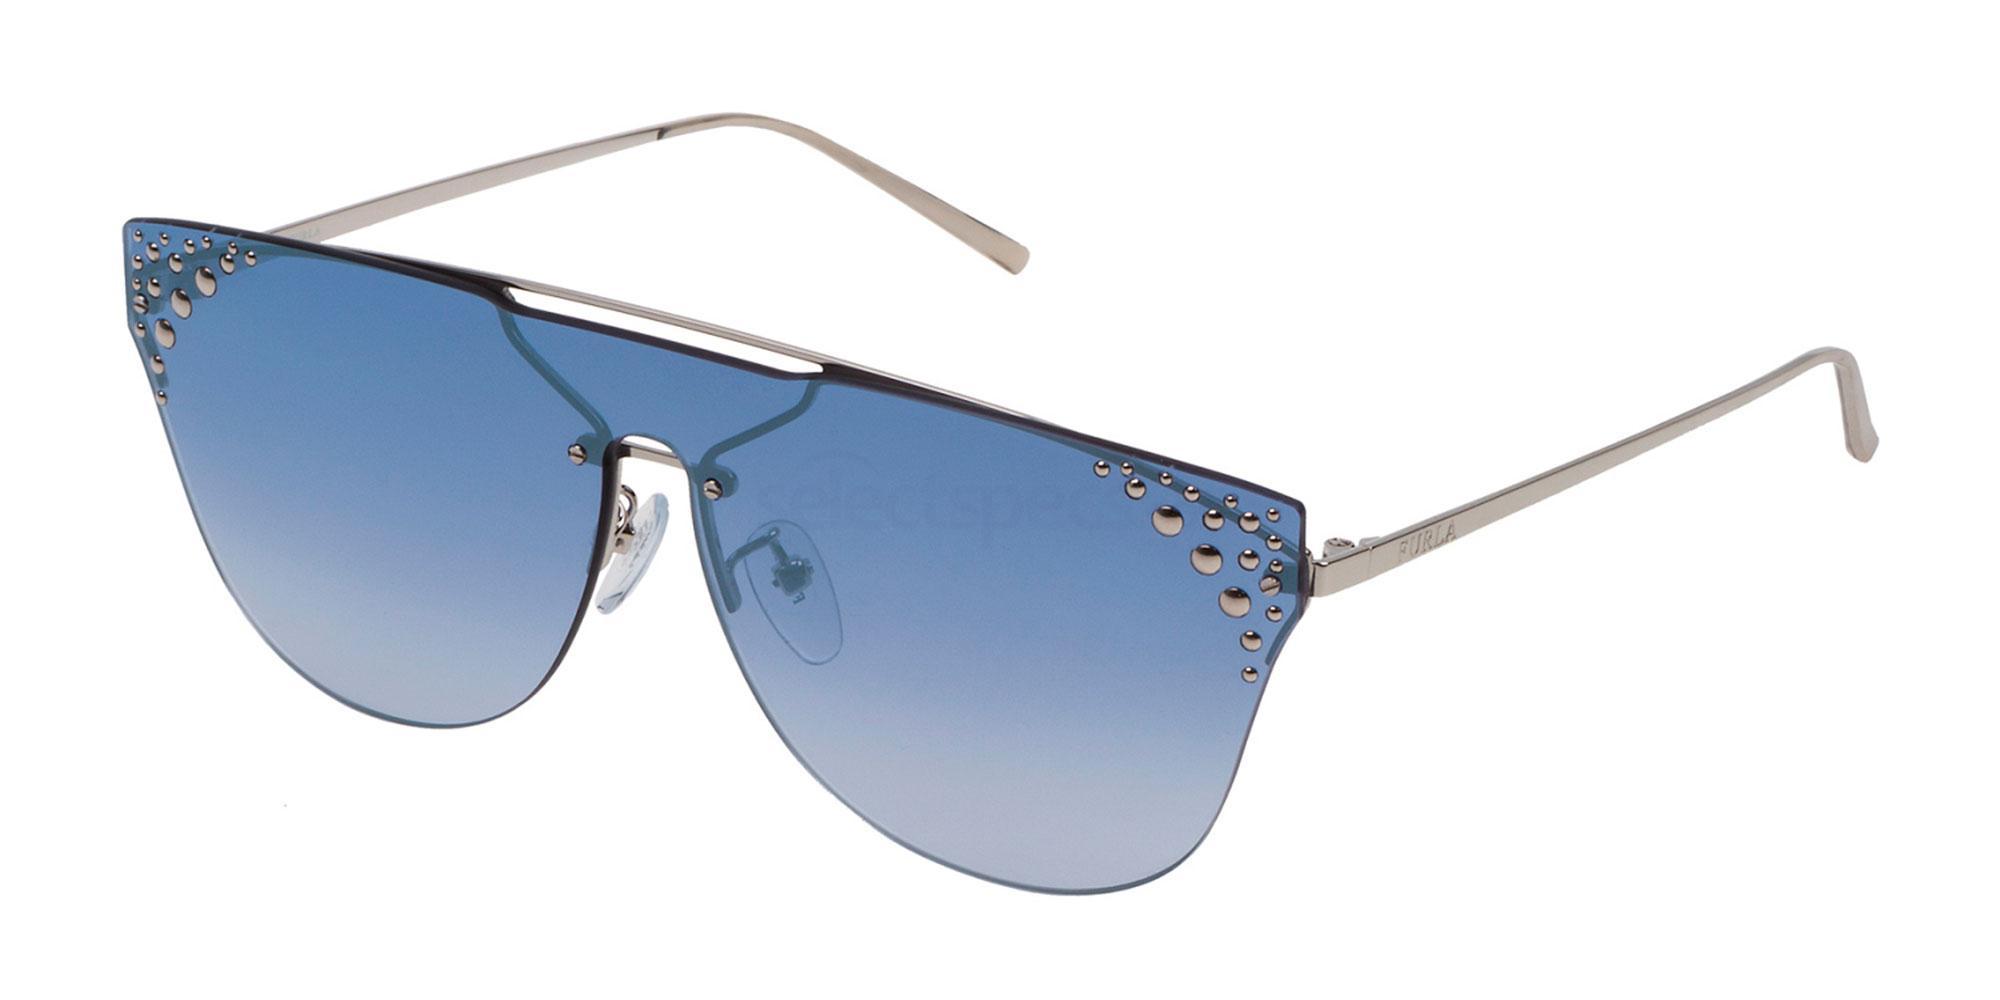 Rimless sunglasses trend 2019 women's fashion